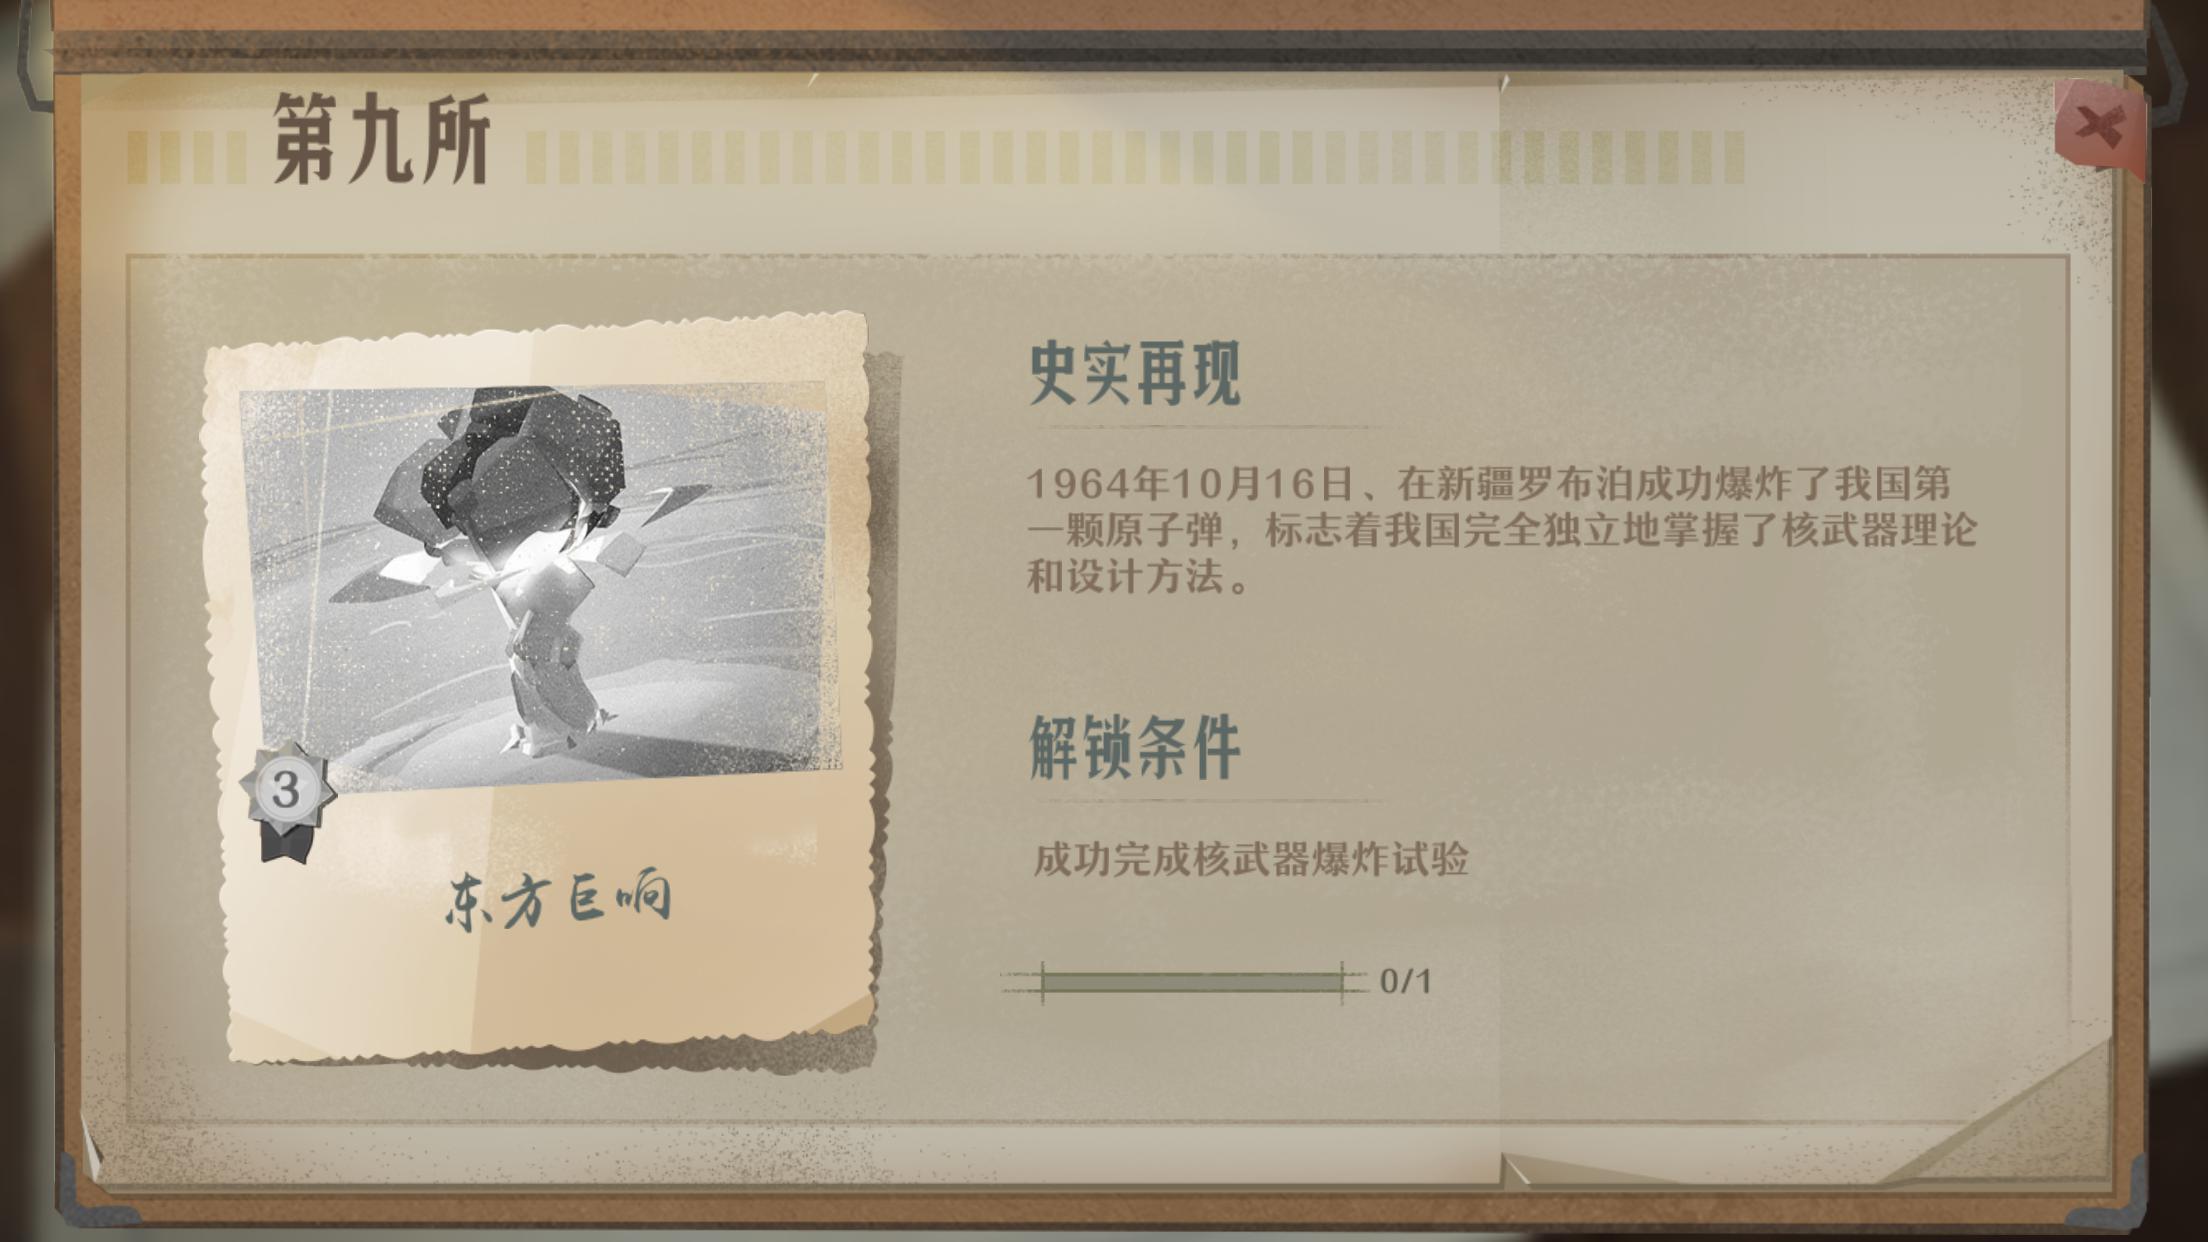 TapTap10分:《第九所》致敬中国宇航人,重温火箭上天!